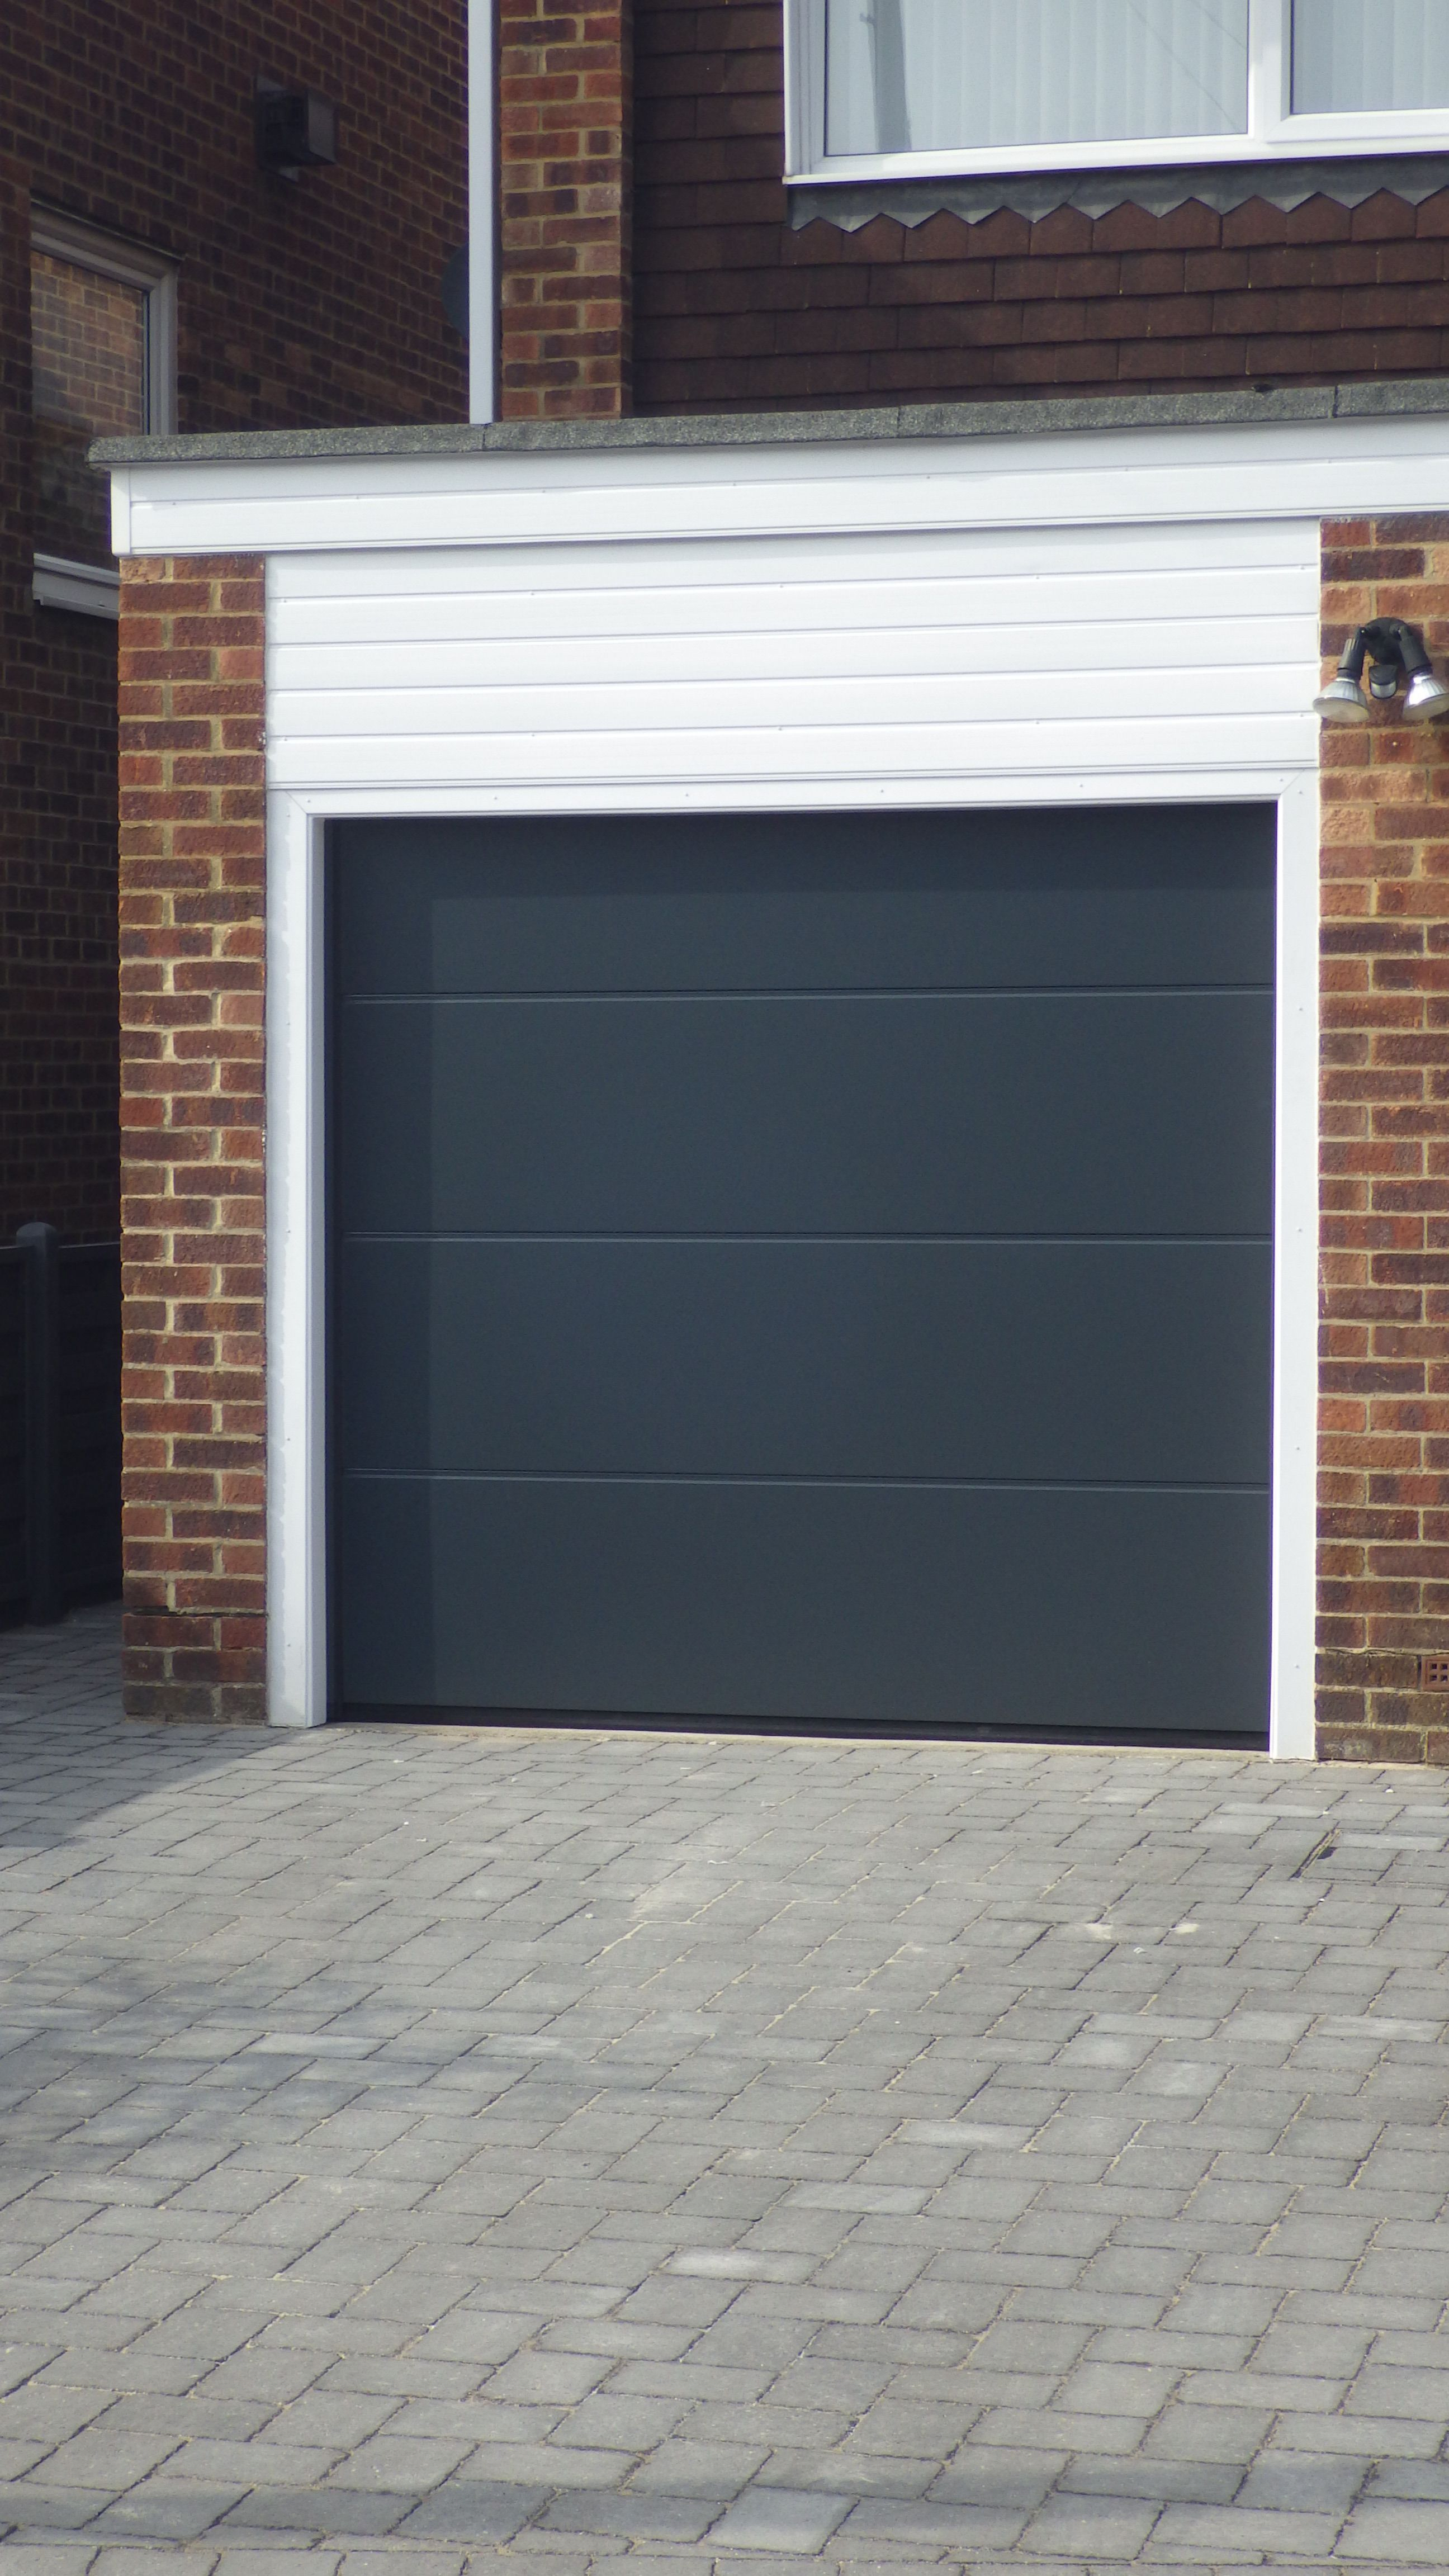 Porte De Garage Hormann Pas Cher hormann sectional l ribbed garage door in anthracite grey in